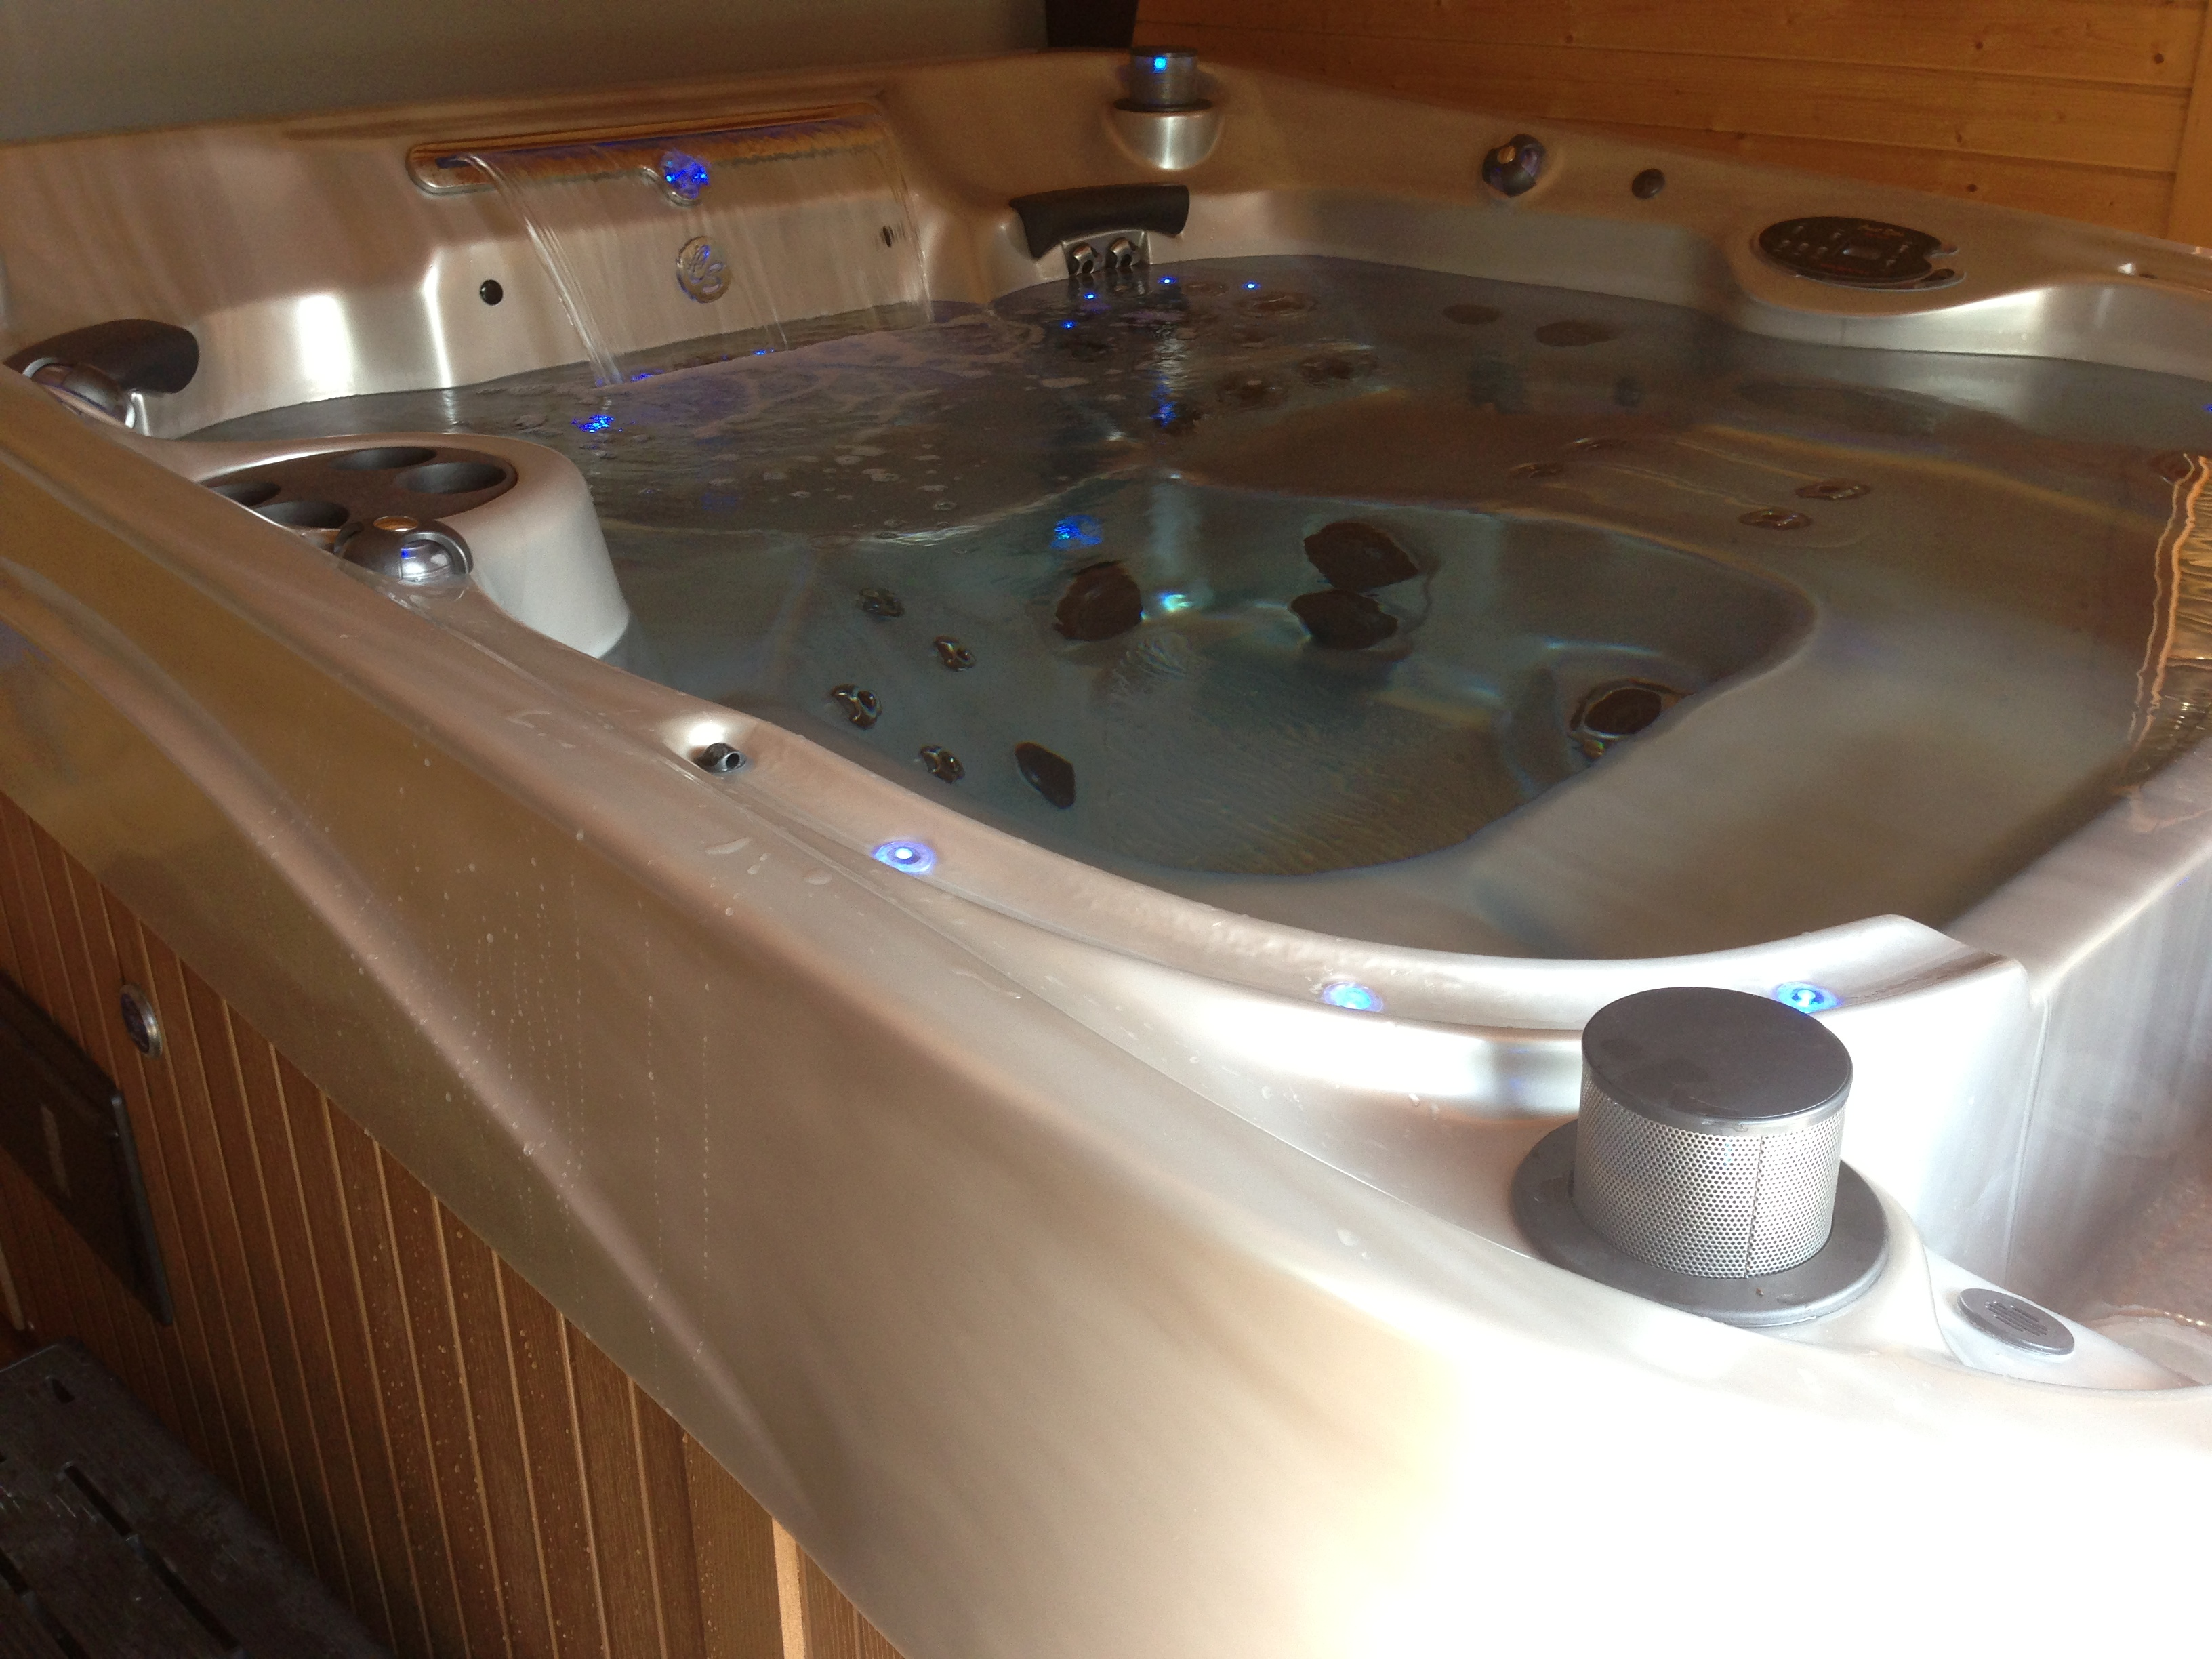 person tub images more coast luxury warwickshire leisure tubs spas horizon jacuzzi hot award